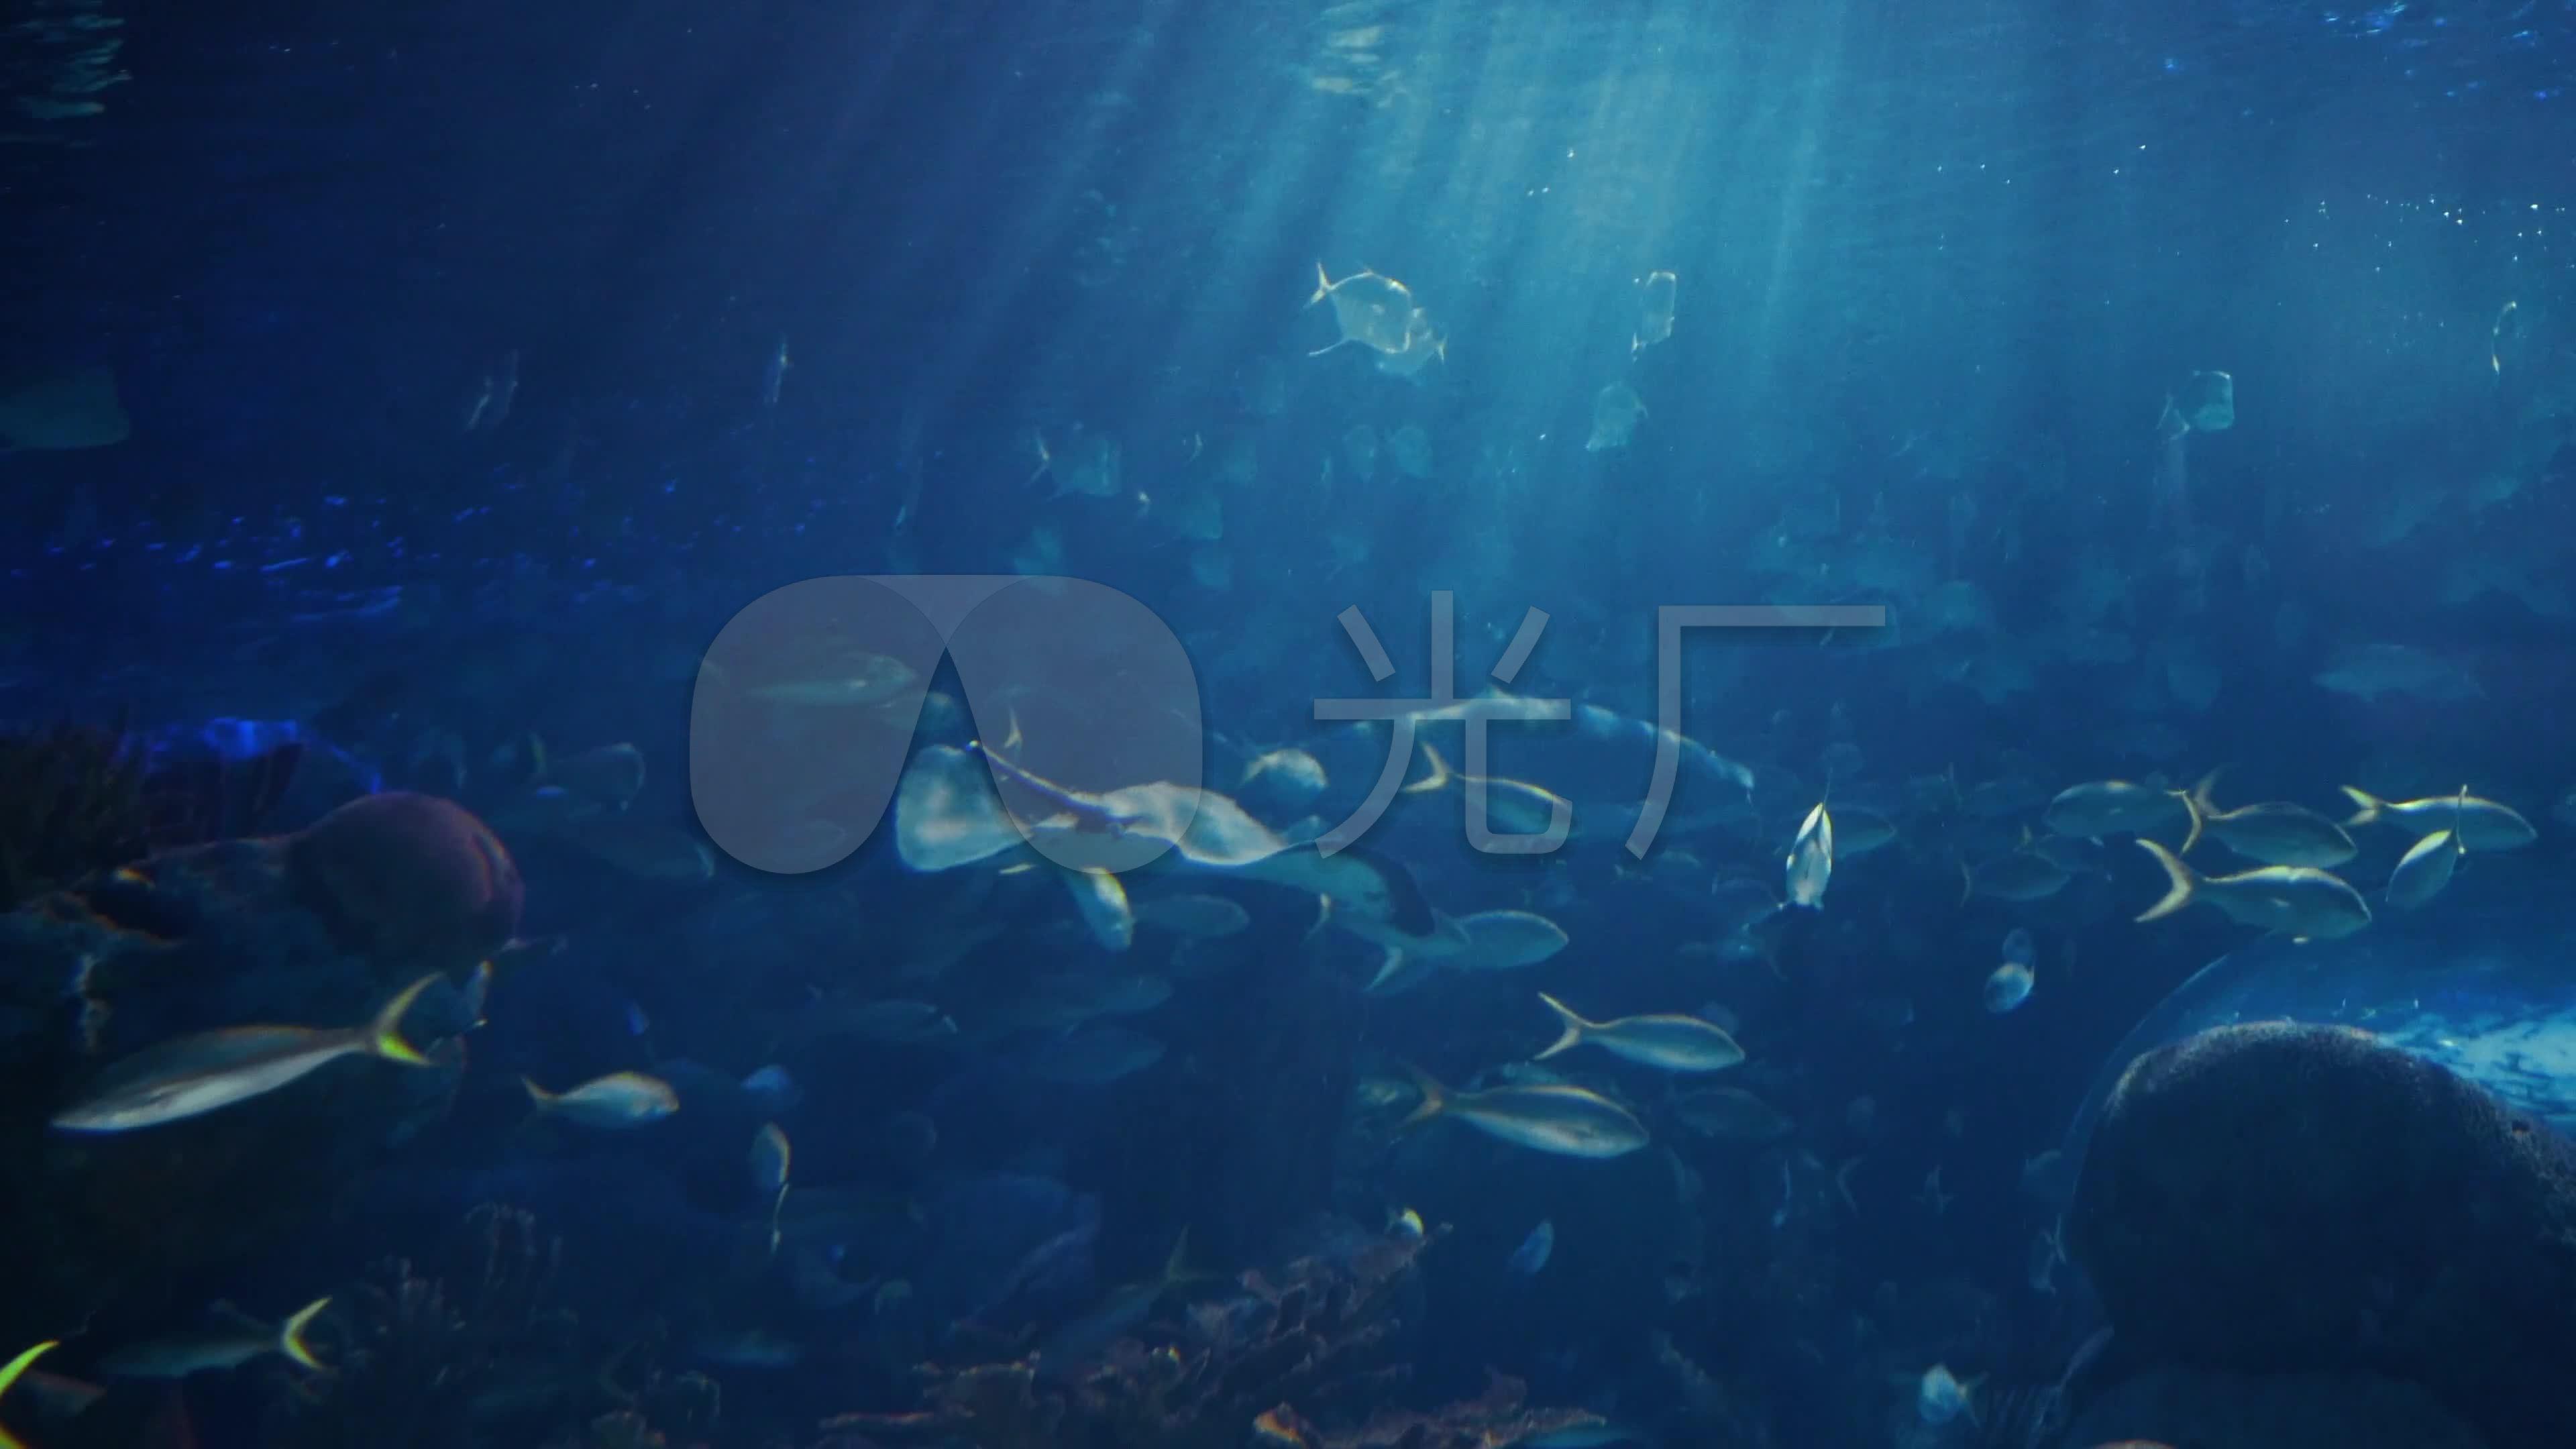 4k海底世界_3840x2160_高清视频素材下载(编号:)_实拍